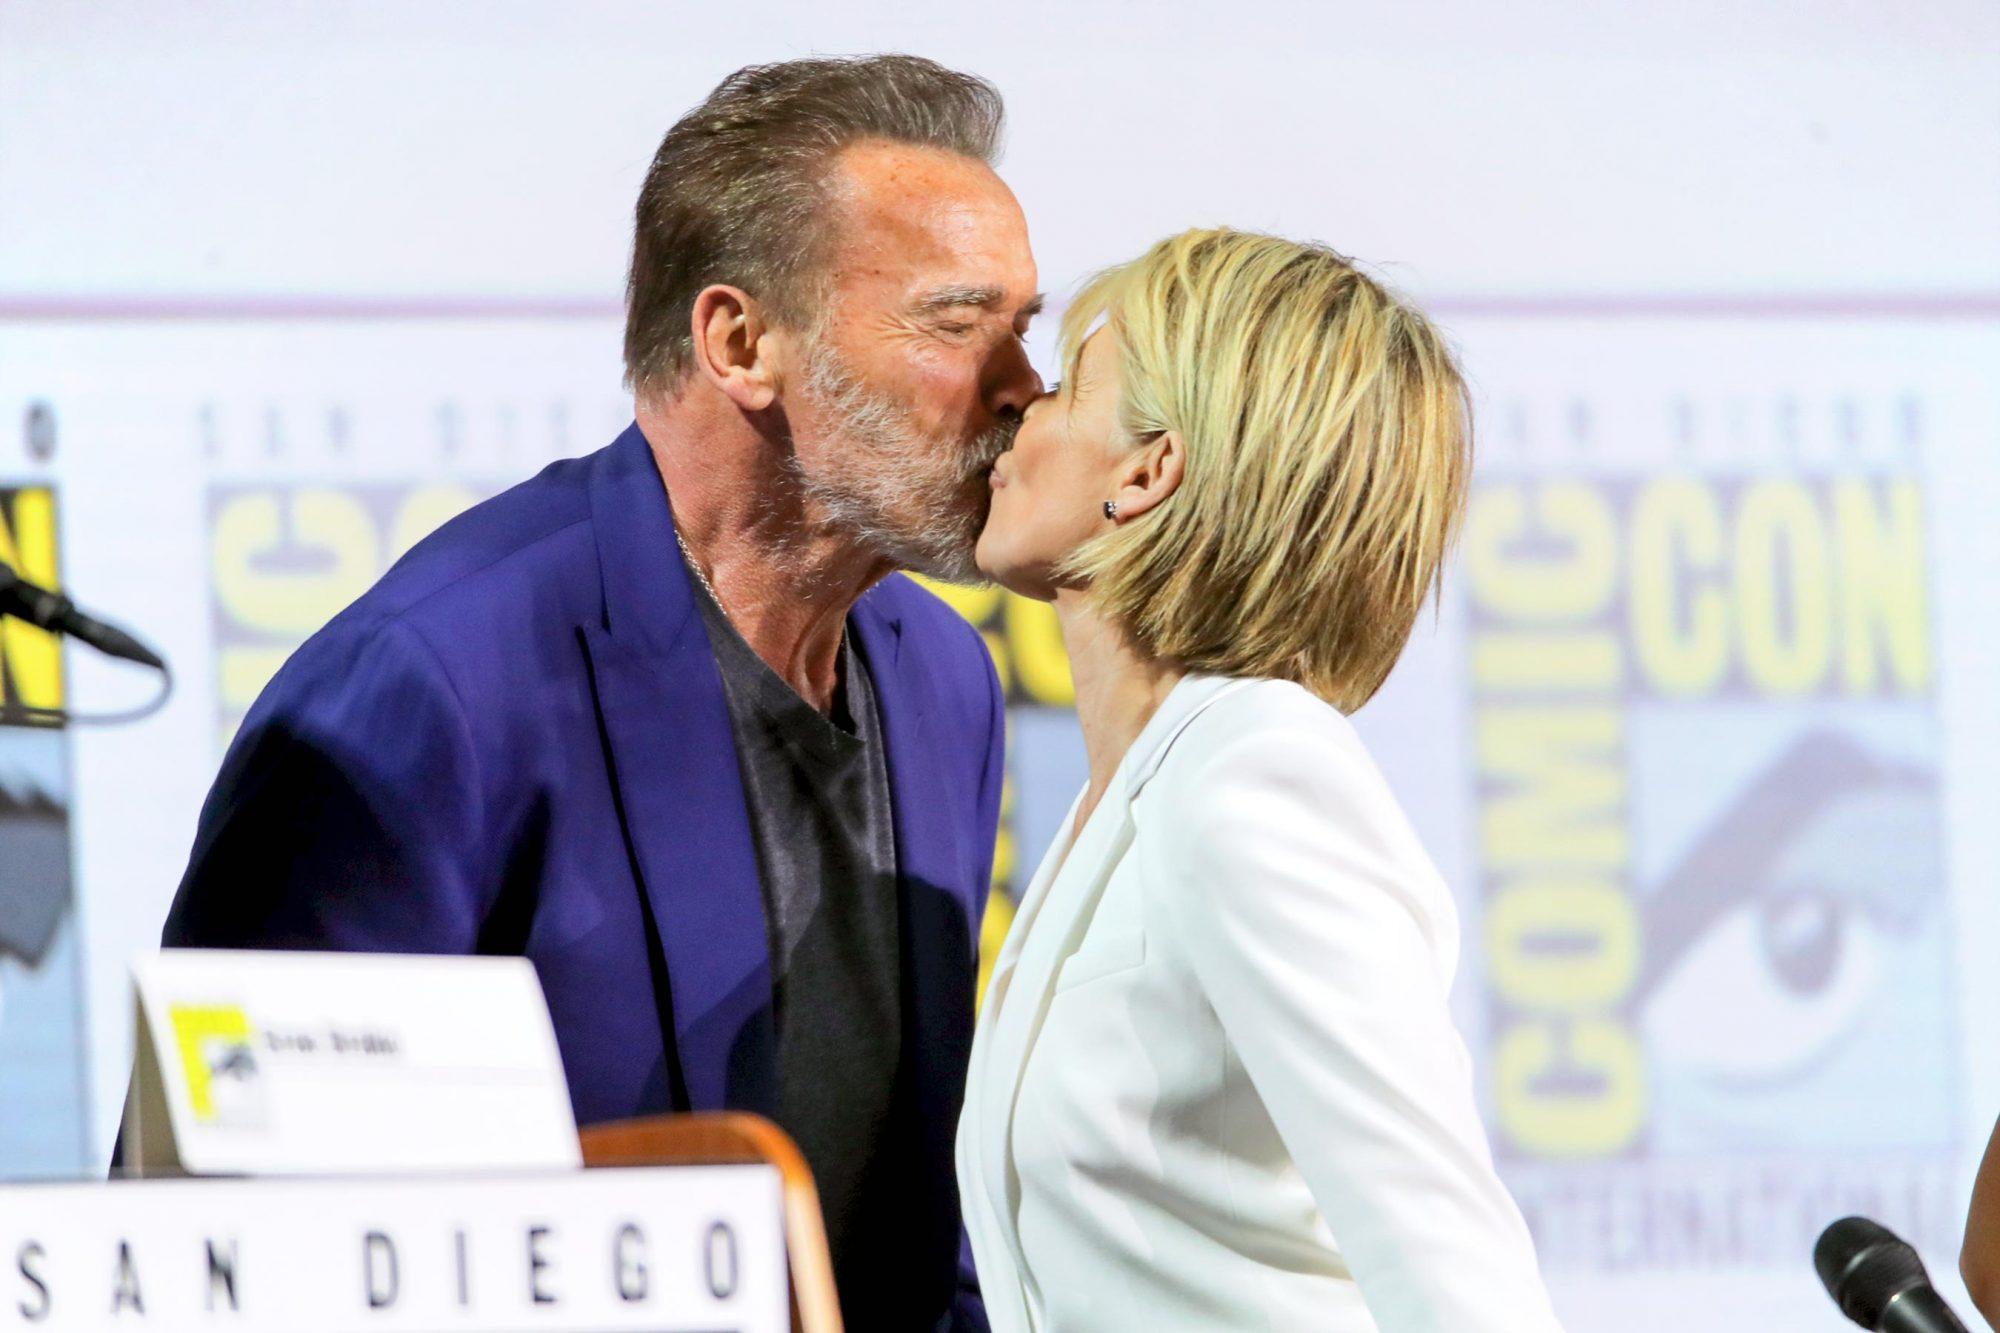 Mandatory Credit: Photo by Chelsea Lauren/Variety/Shutterstock (10338127j) Arnold Schwarzenegger and Linda Hamilton 'Terminator: Dark Fate' film panel, Comic-Con International, San Diego, USA - 18 Jul 2019